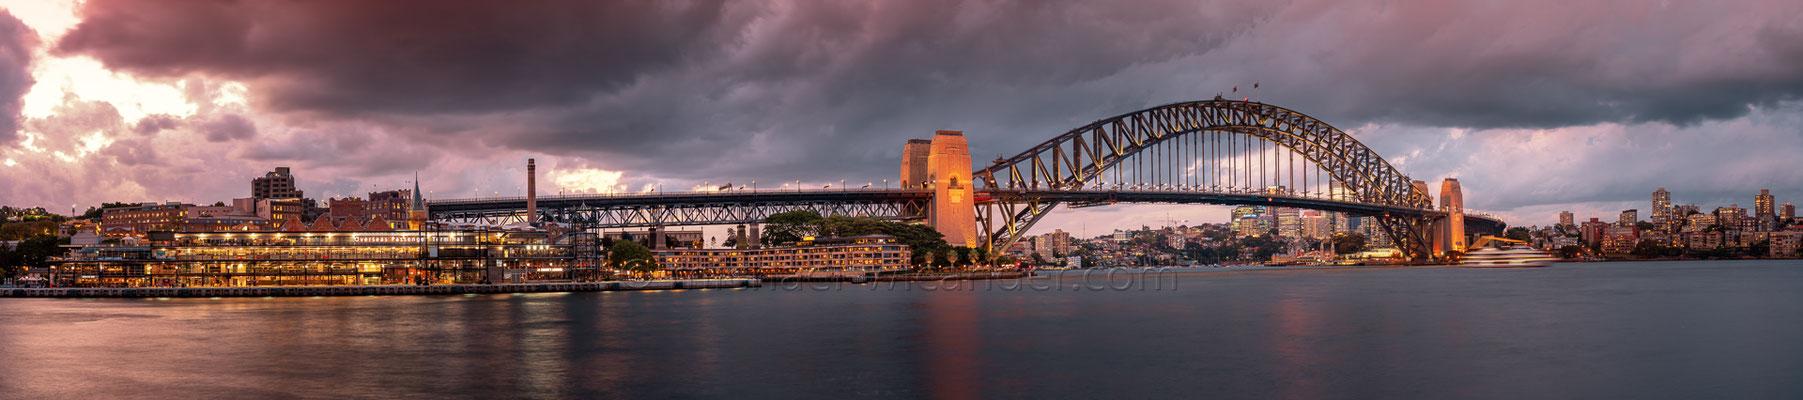 Sydney Skyline Panorama 19 14